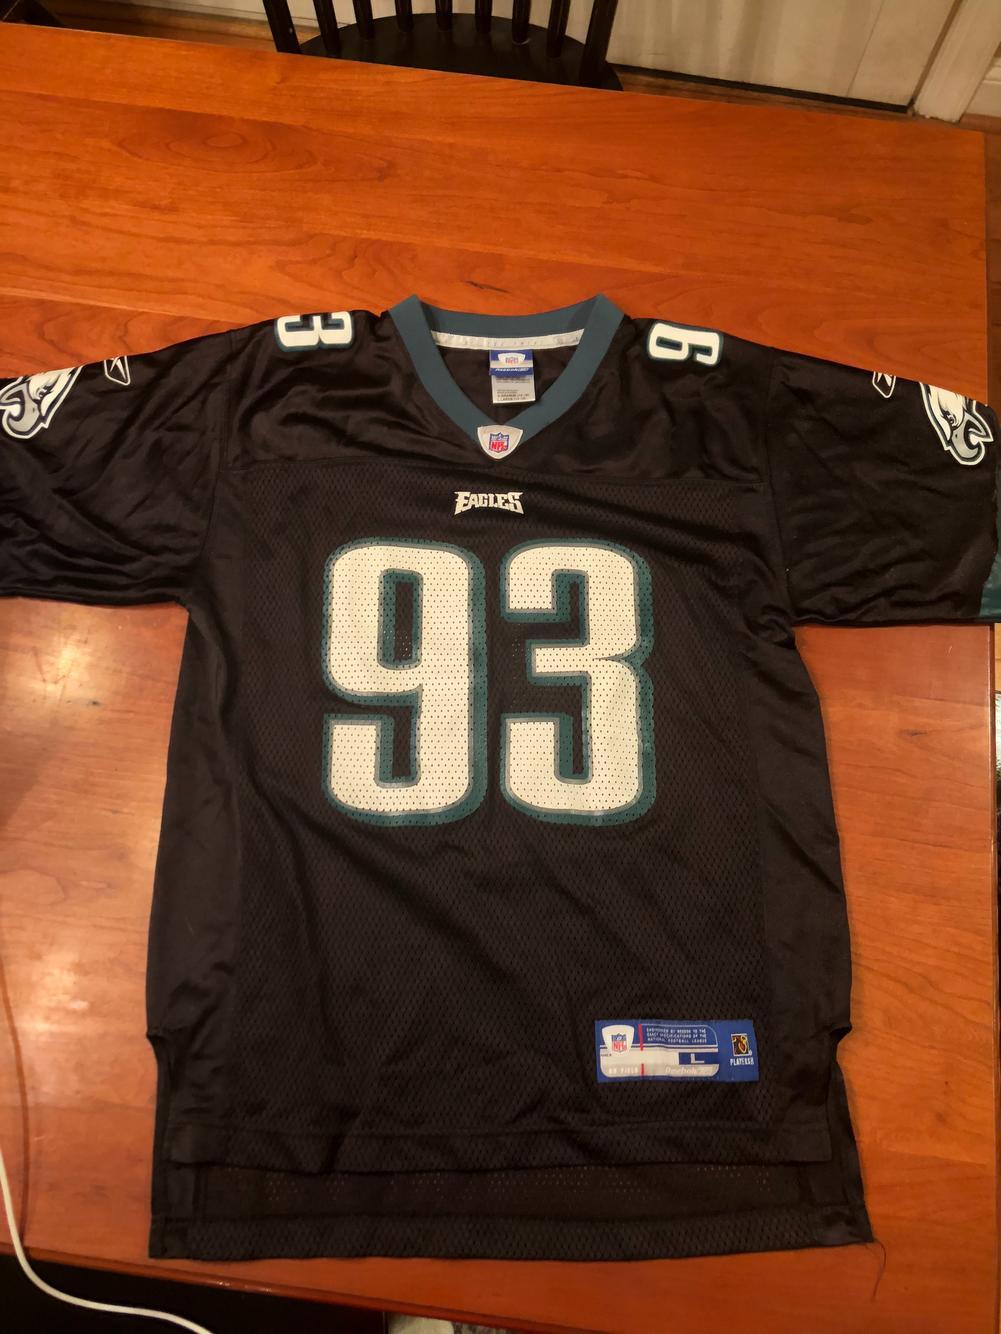 Jevon Kearse Black Philadelphia Eagles Jersey #93. (14-16) youth large